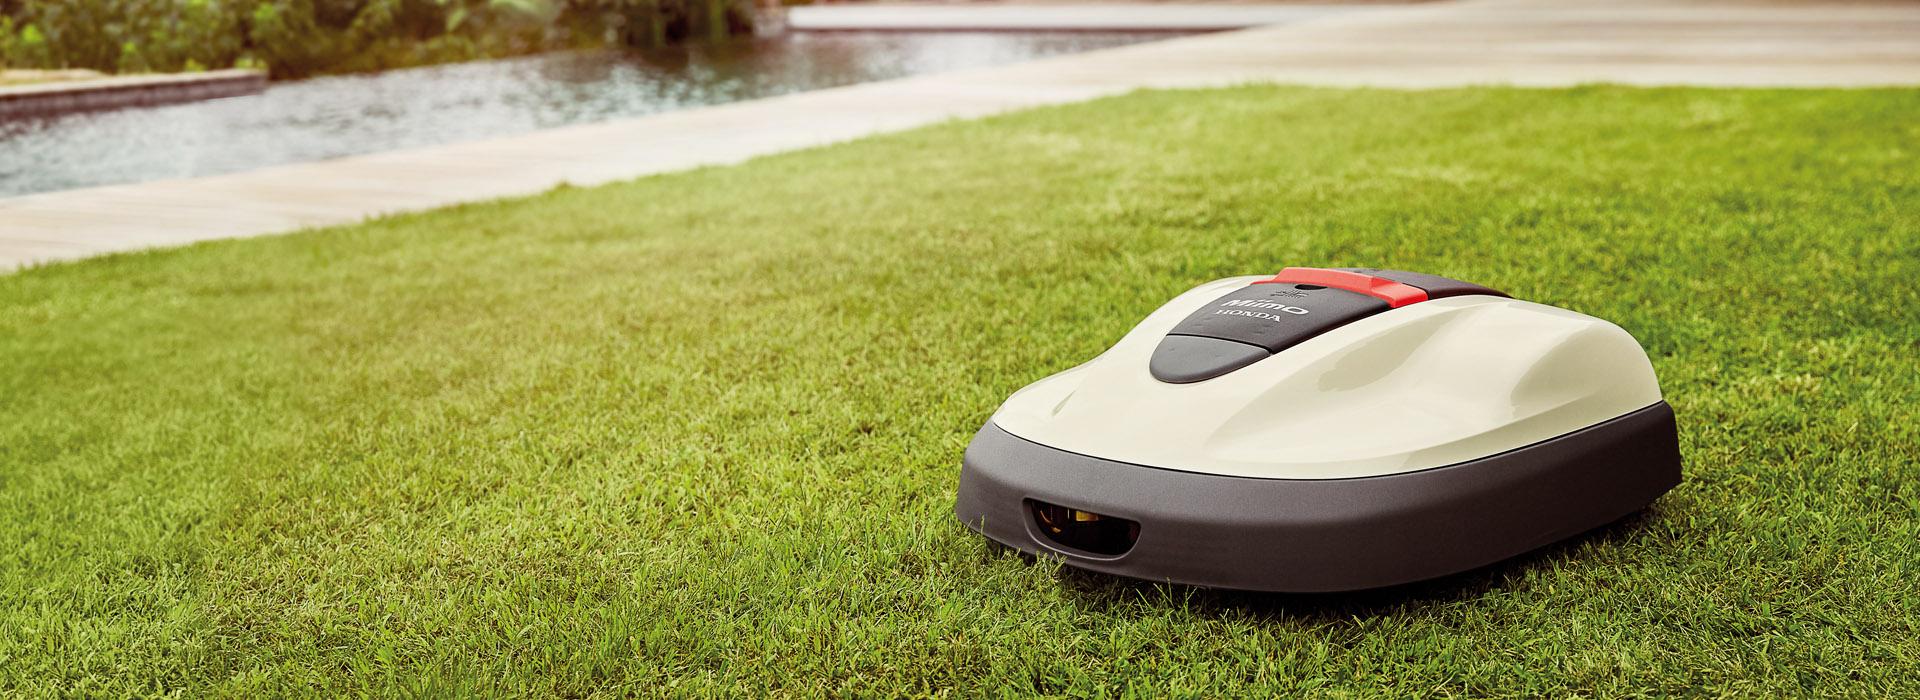 Boerger-Motorgeraete-Honda-Miimo-Rasenroboter-im-Einsatz-perfekter-Rasen